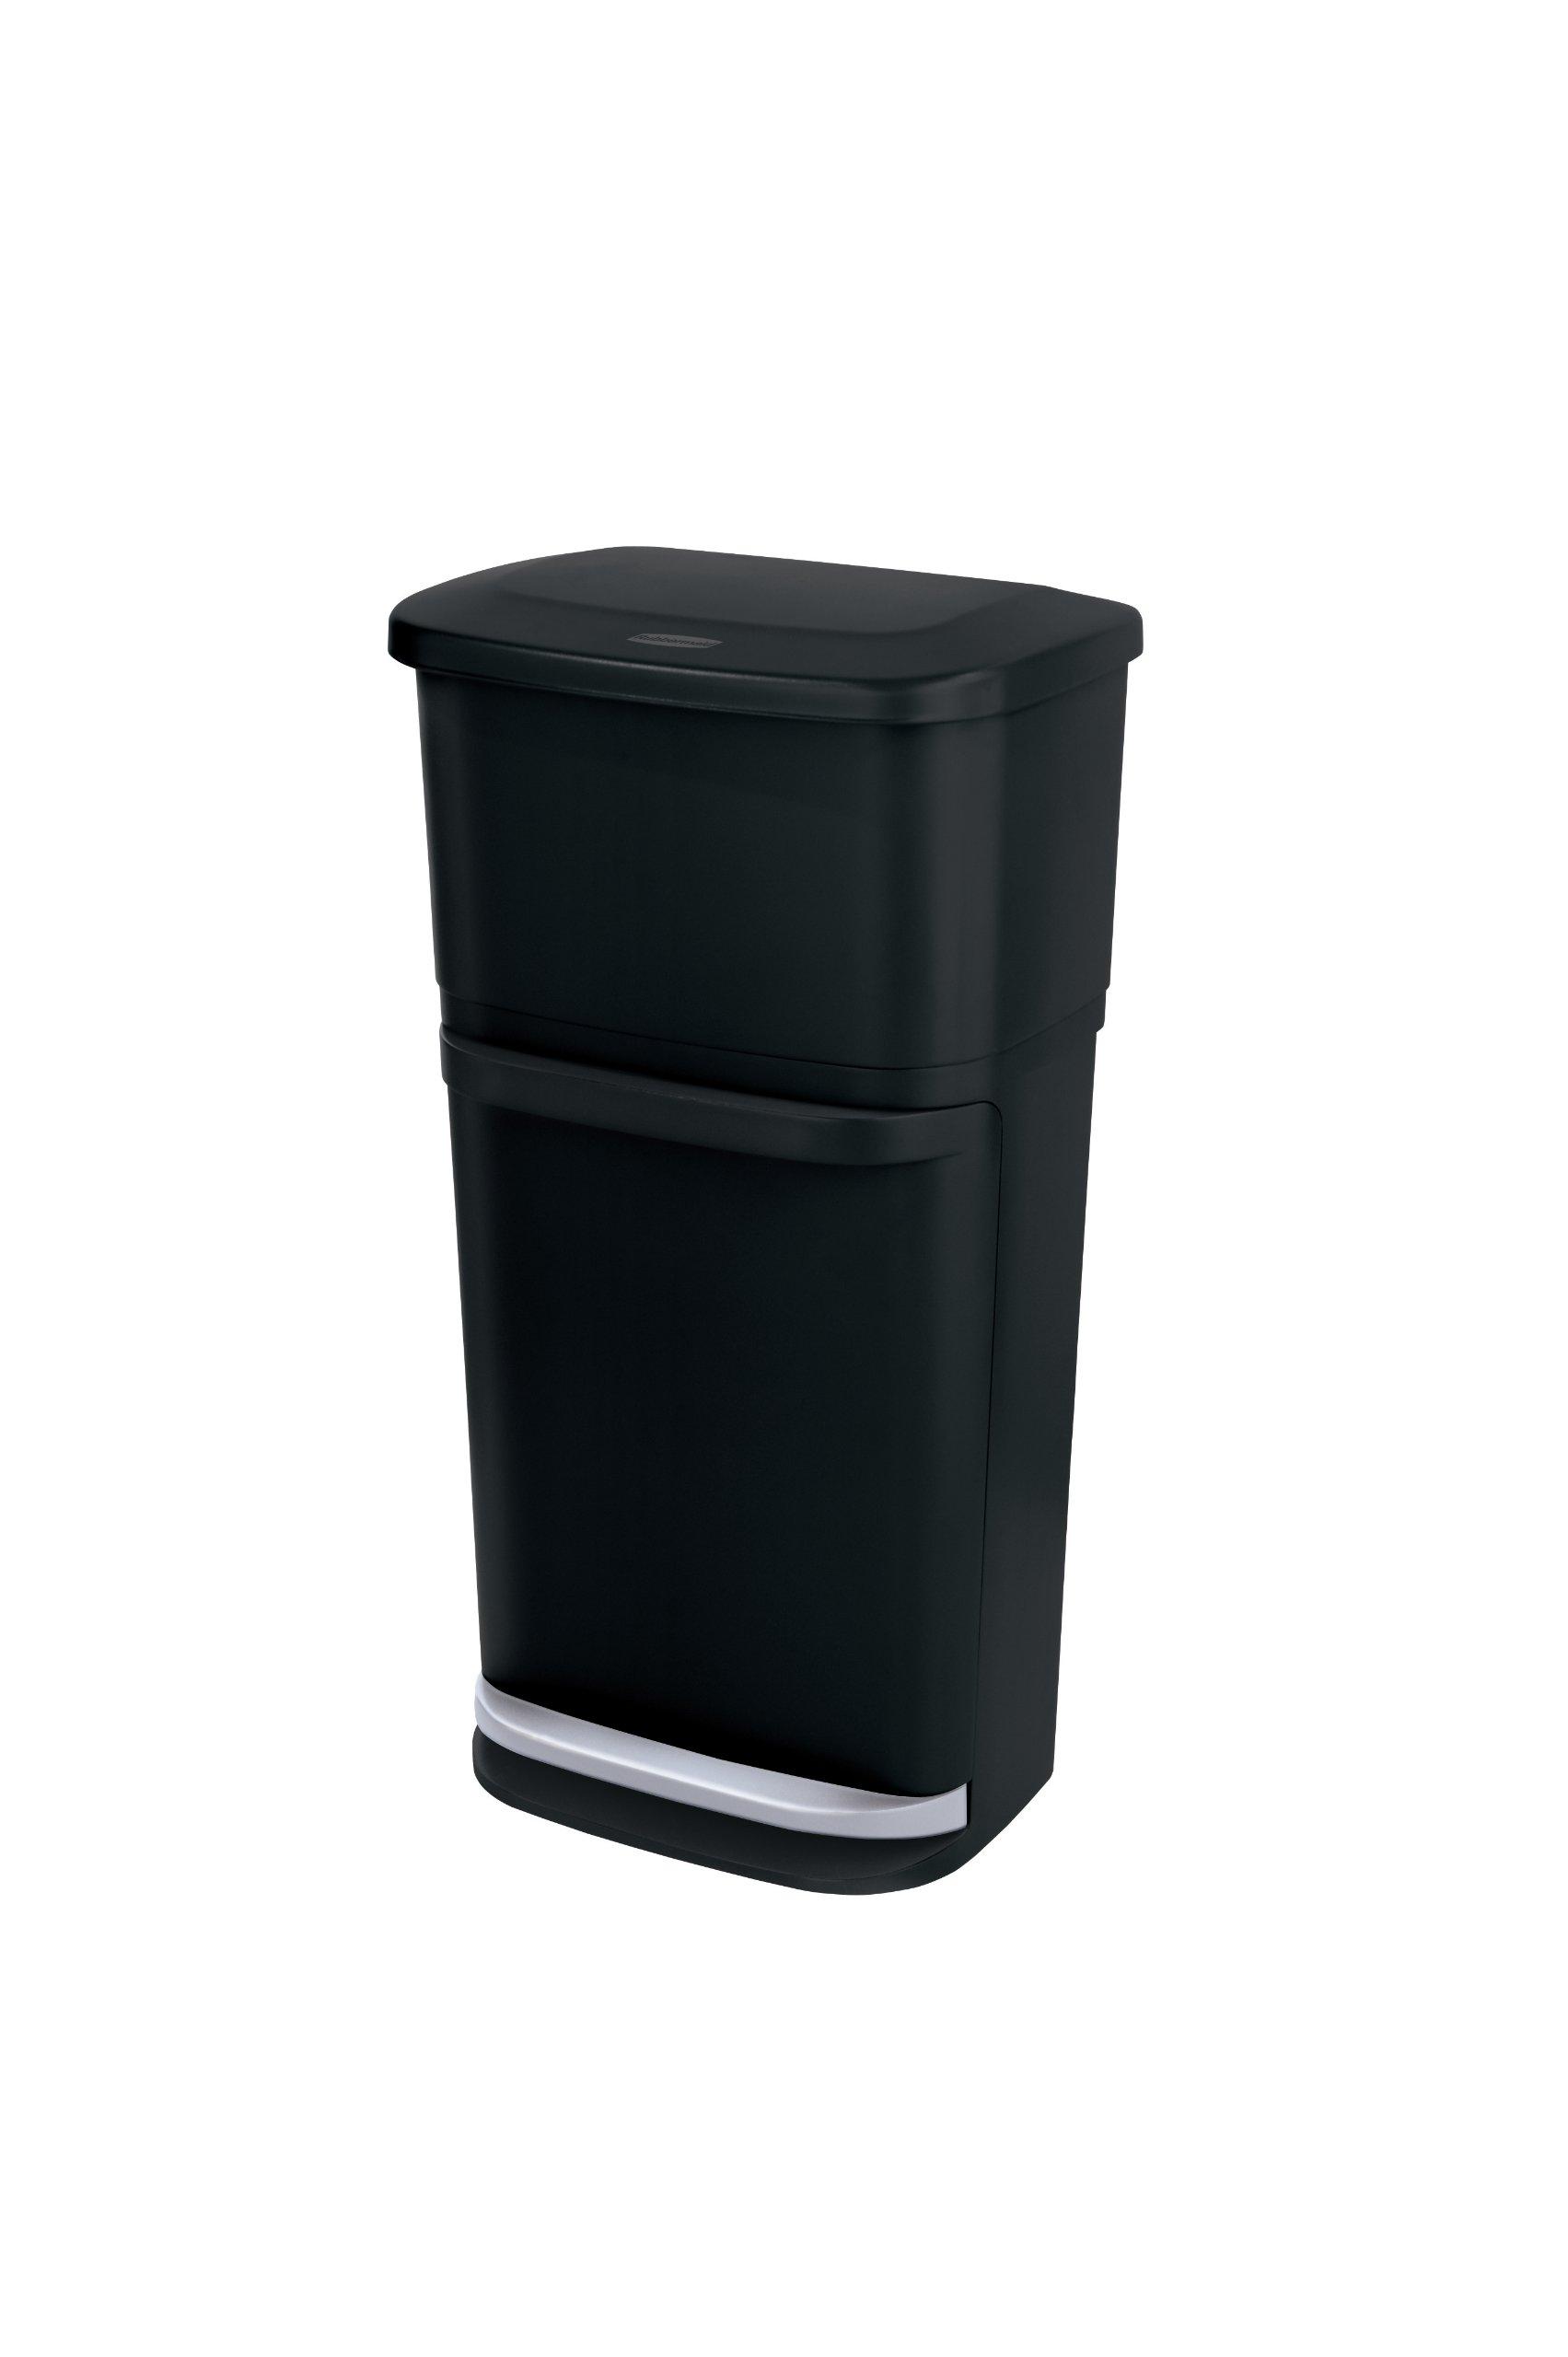 Rubbermaid 1819956 2-in-1 Recycler, Black by Rubbermaid